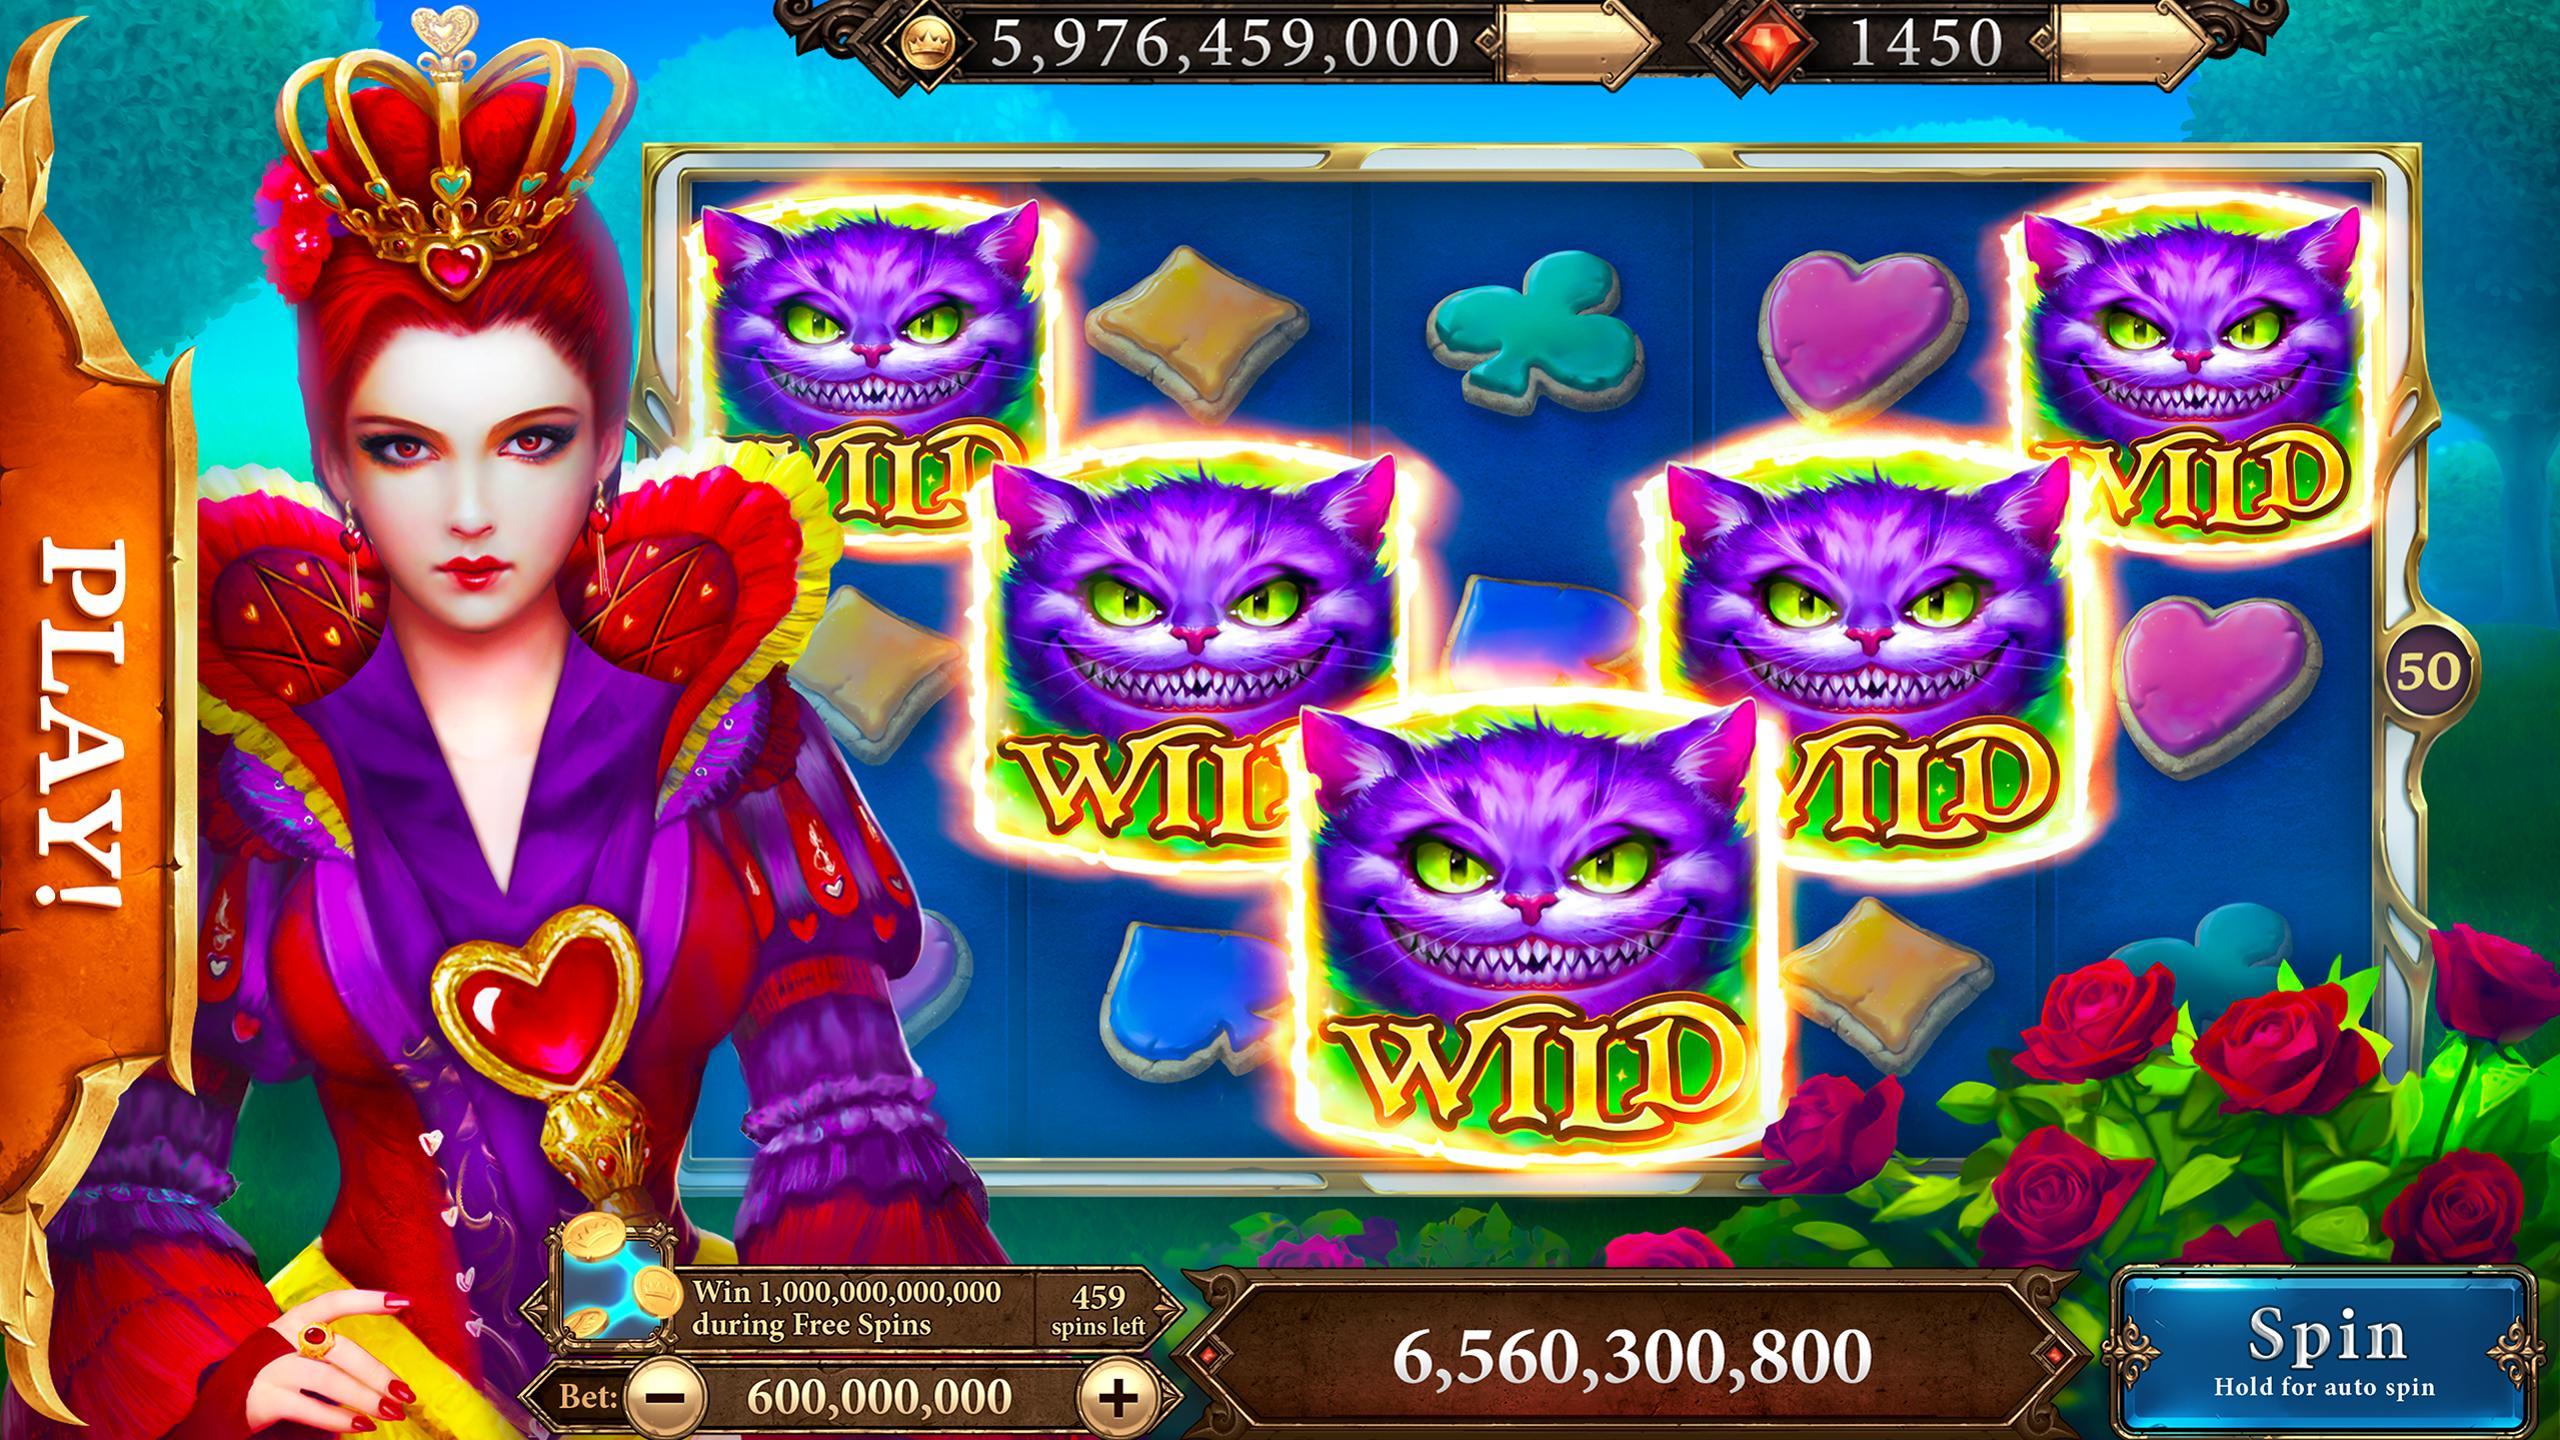 Scatter Slots Las Vegas Casino Game 777 Online 3.87.0 Screenshot 18